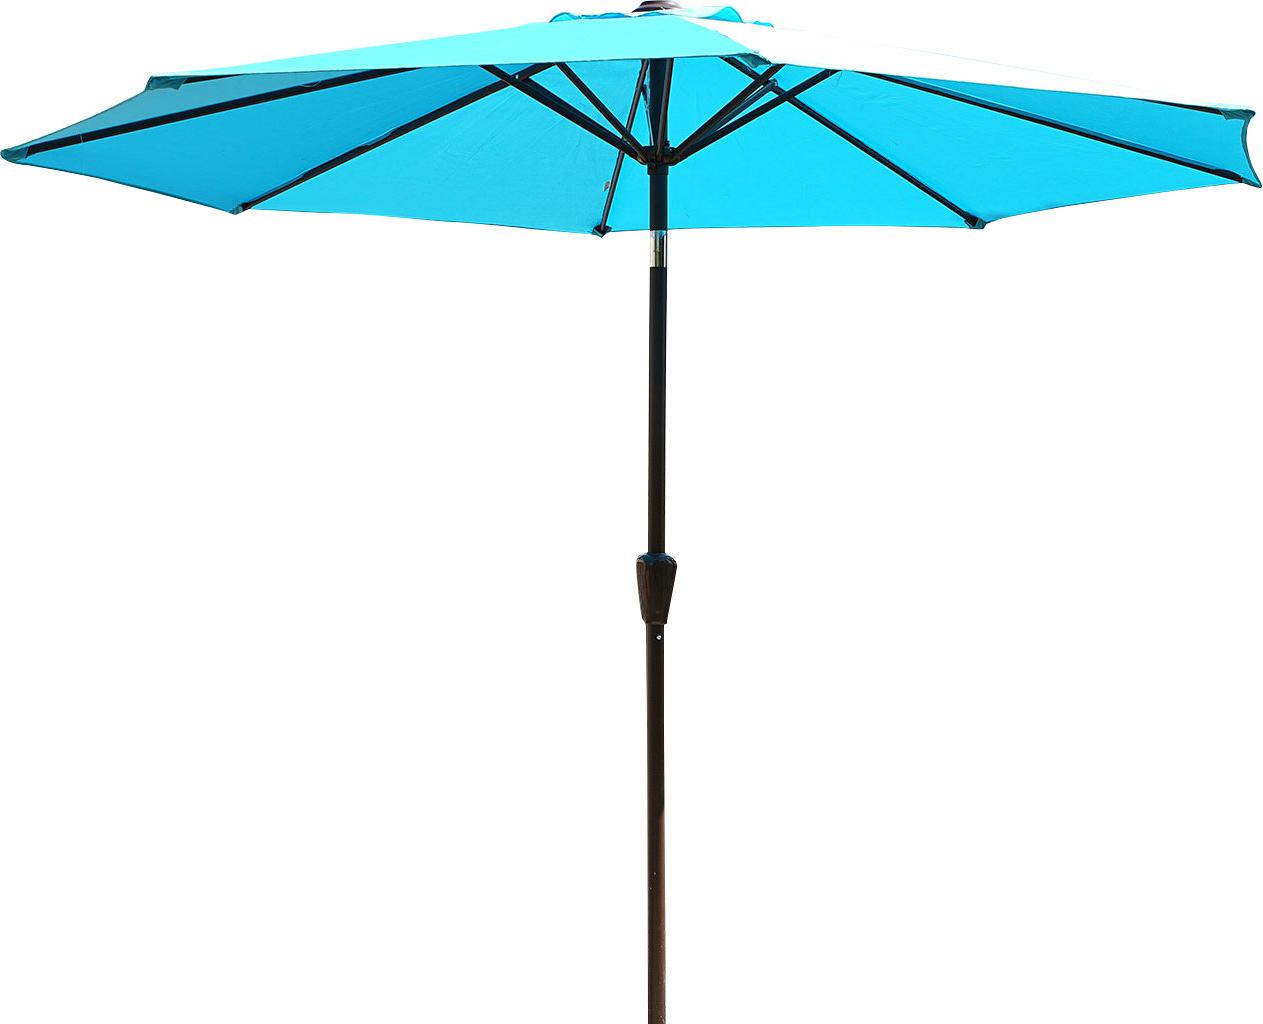 Taube Market Umbrellas For Recent Taube 9' Market Umbrella (View 2 of 20)